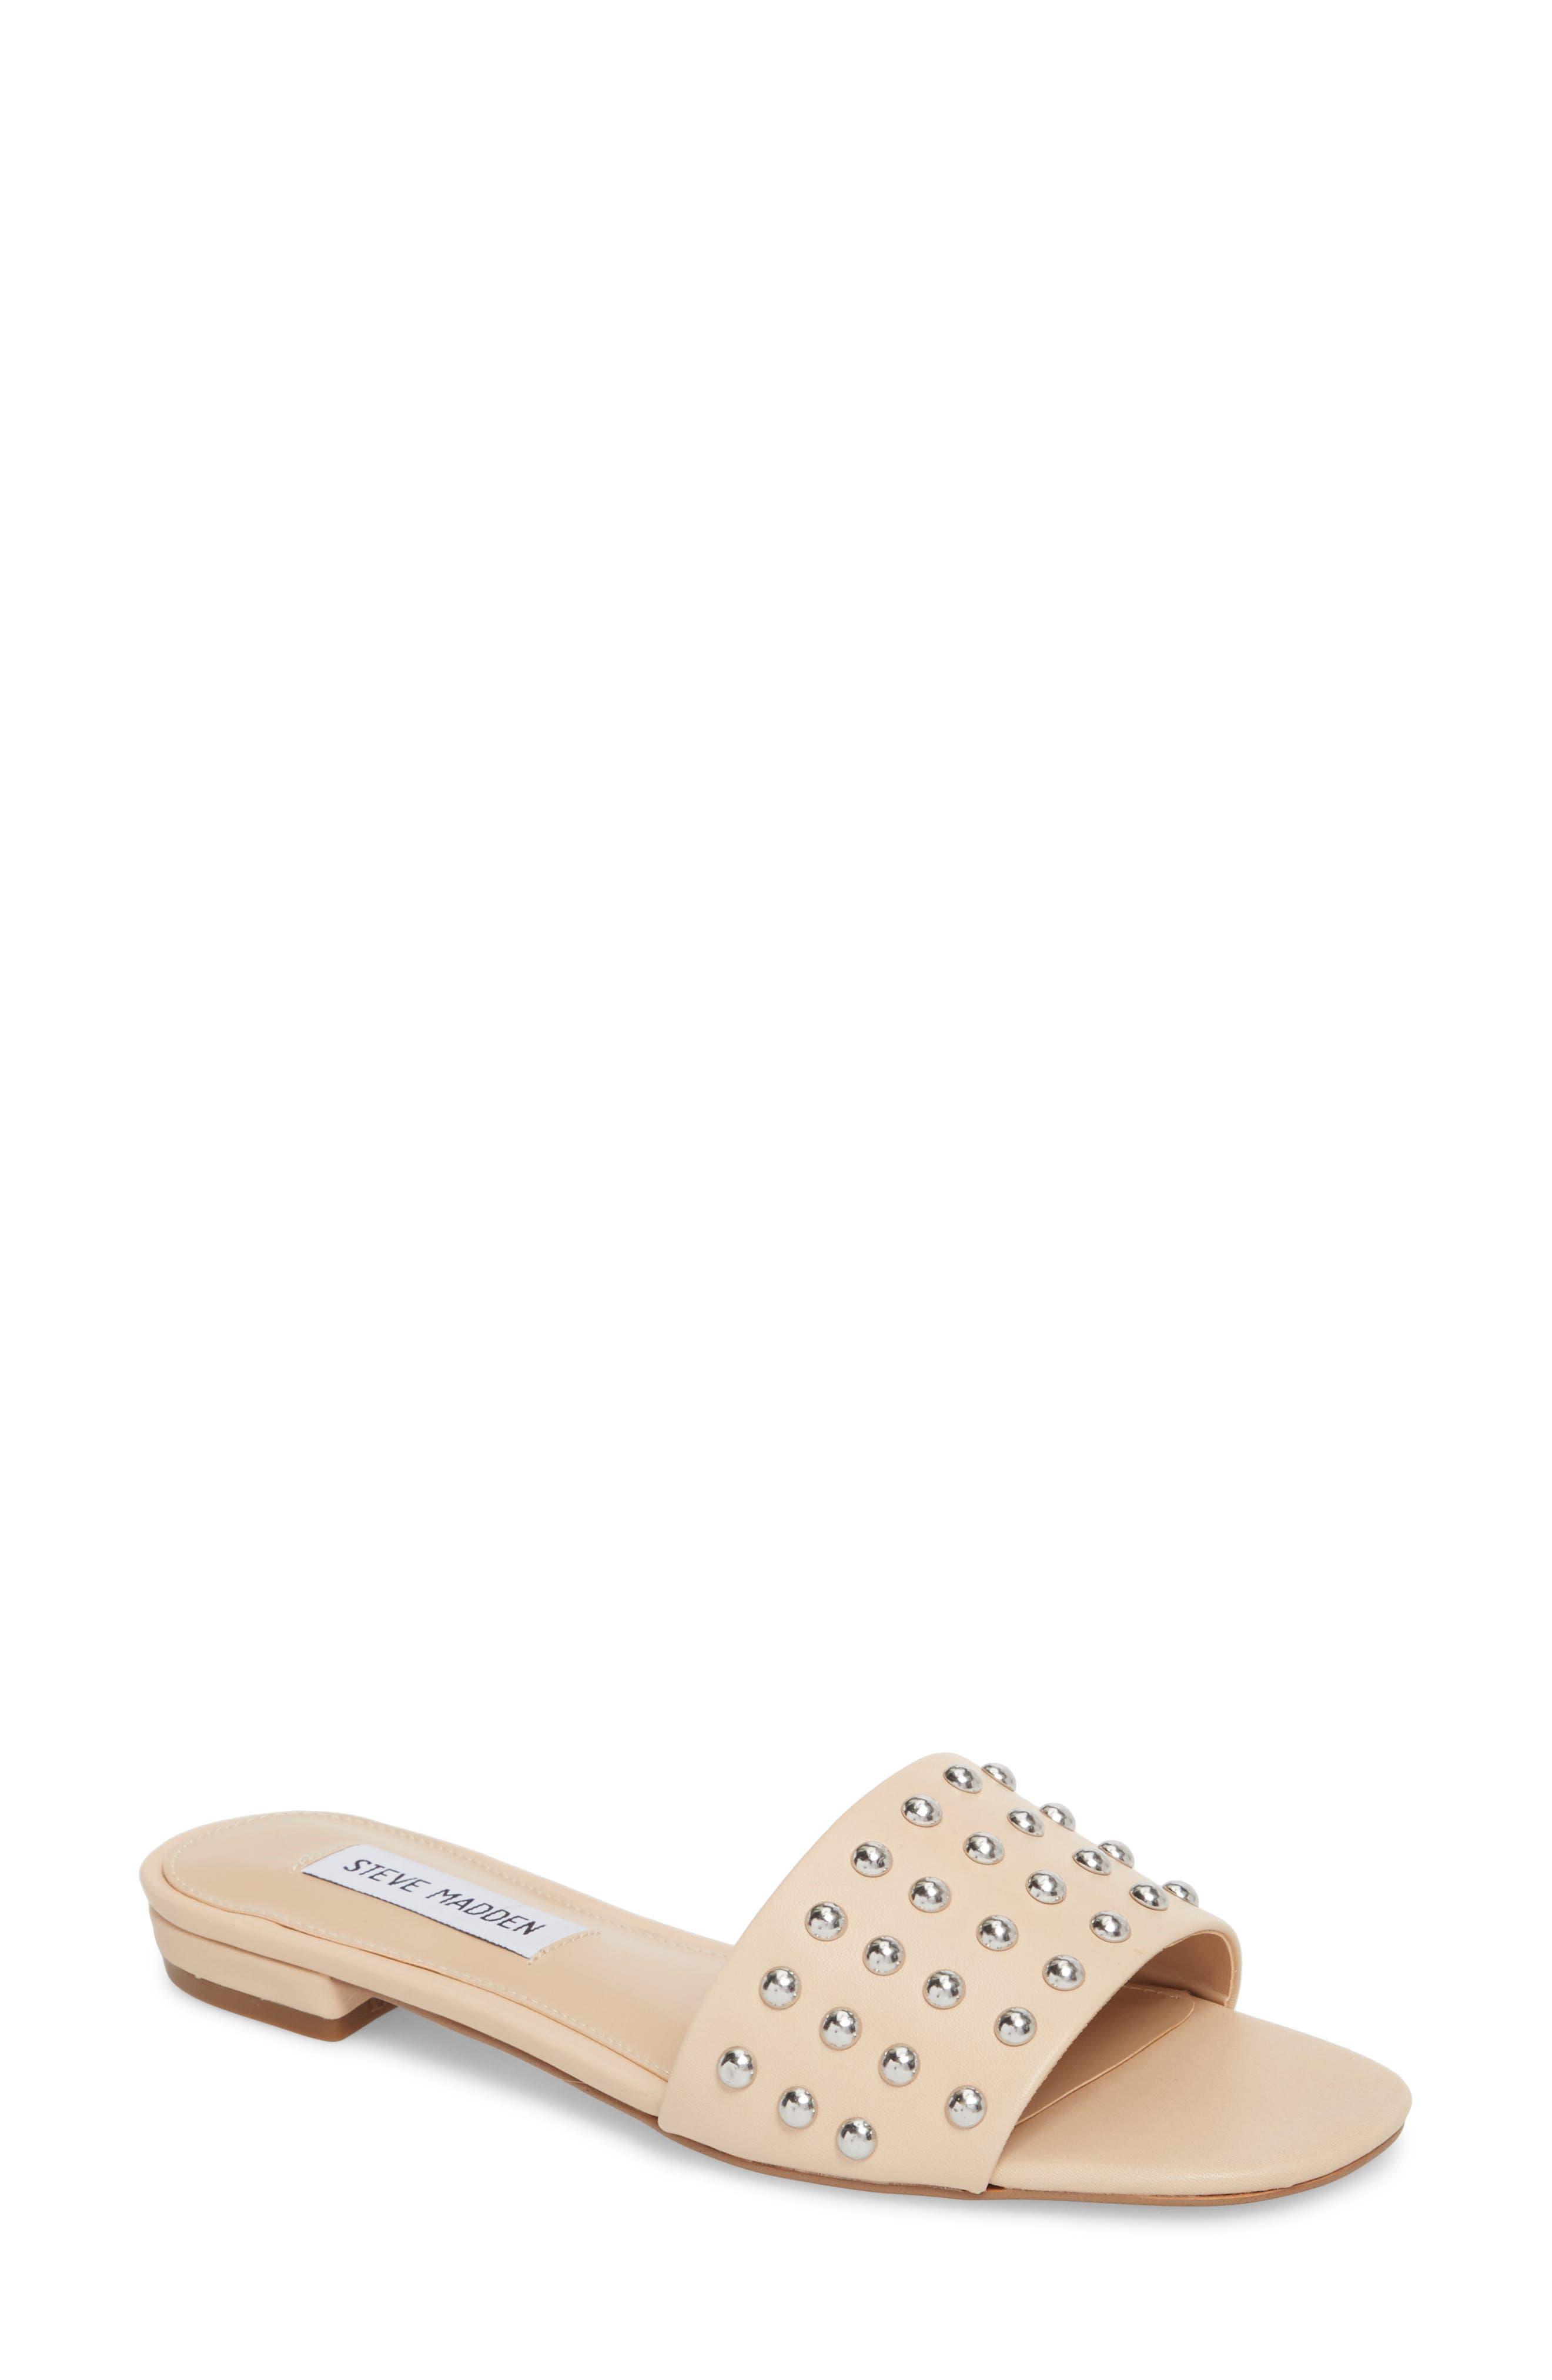 Viv Studded Slide Sandal,                             Main thumbnail 1, color,                             Blush Leather